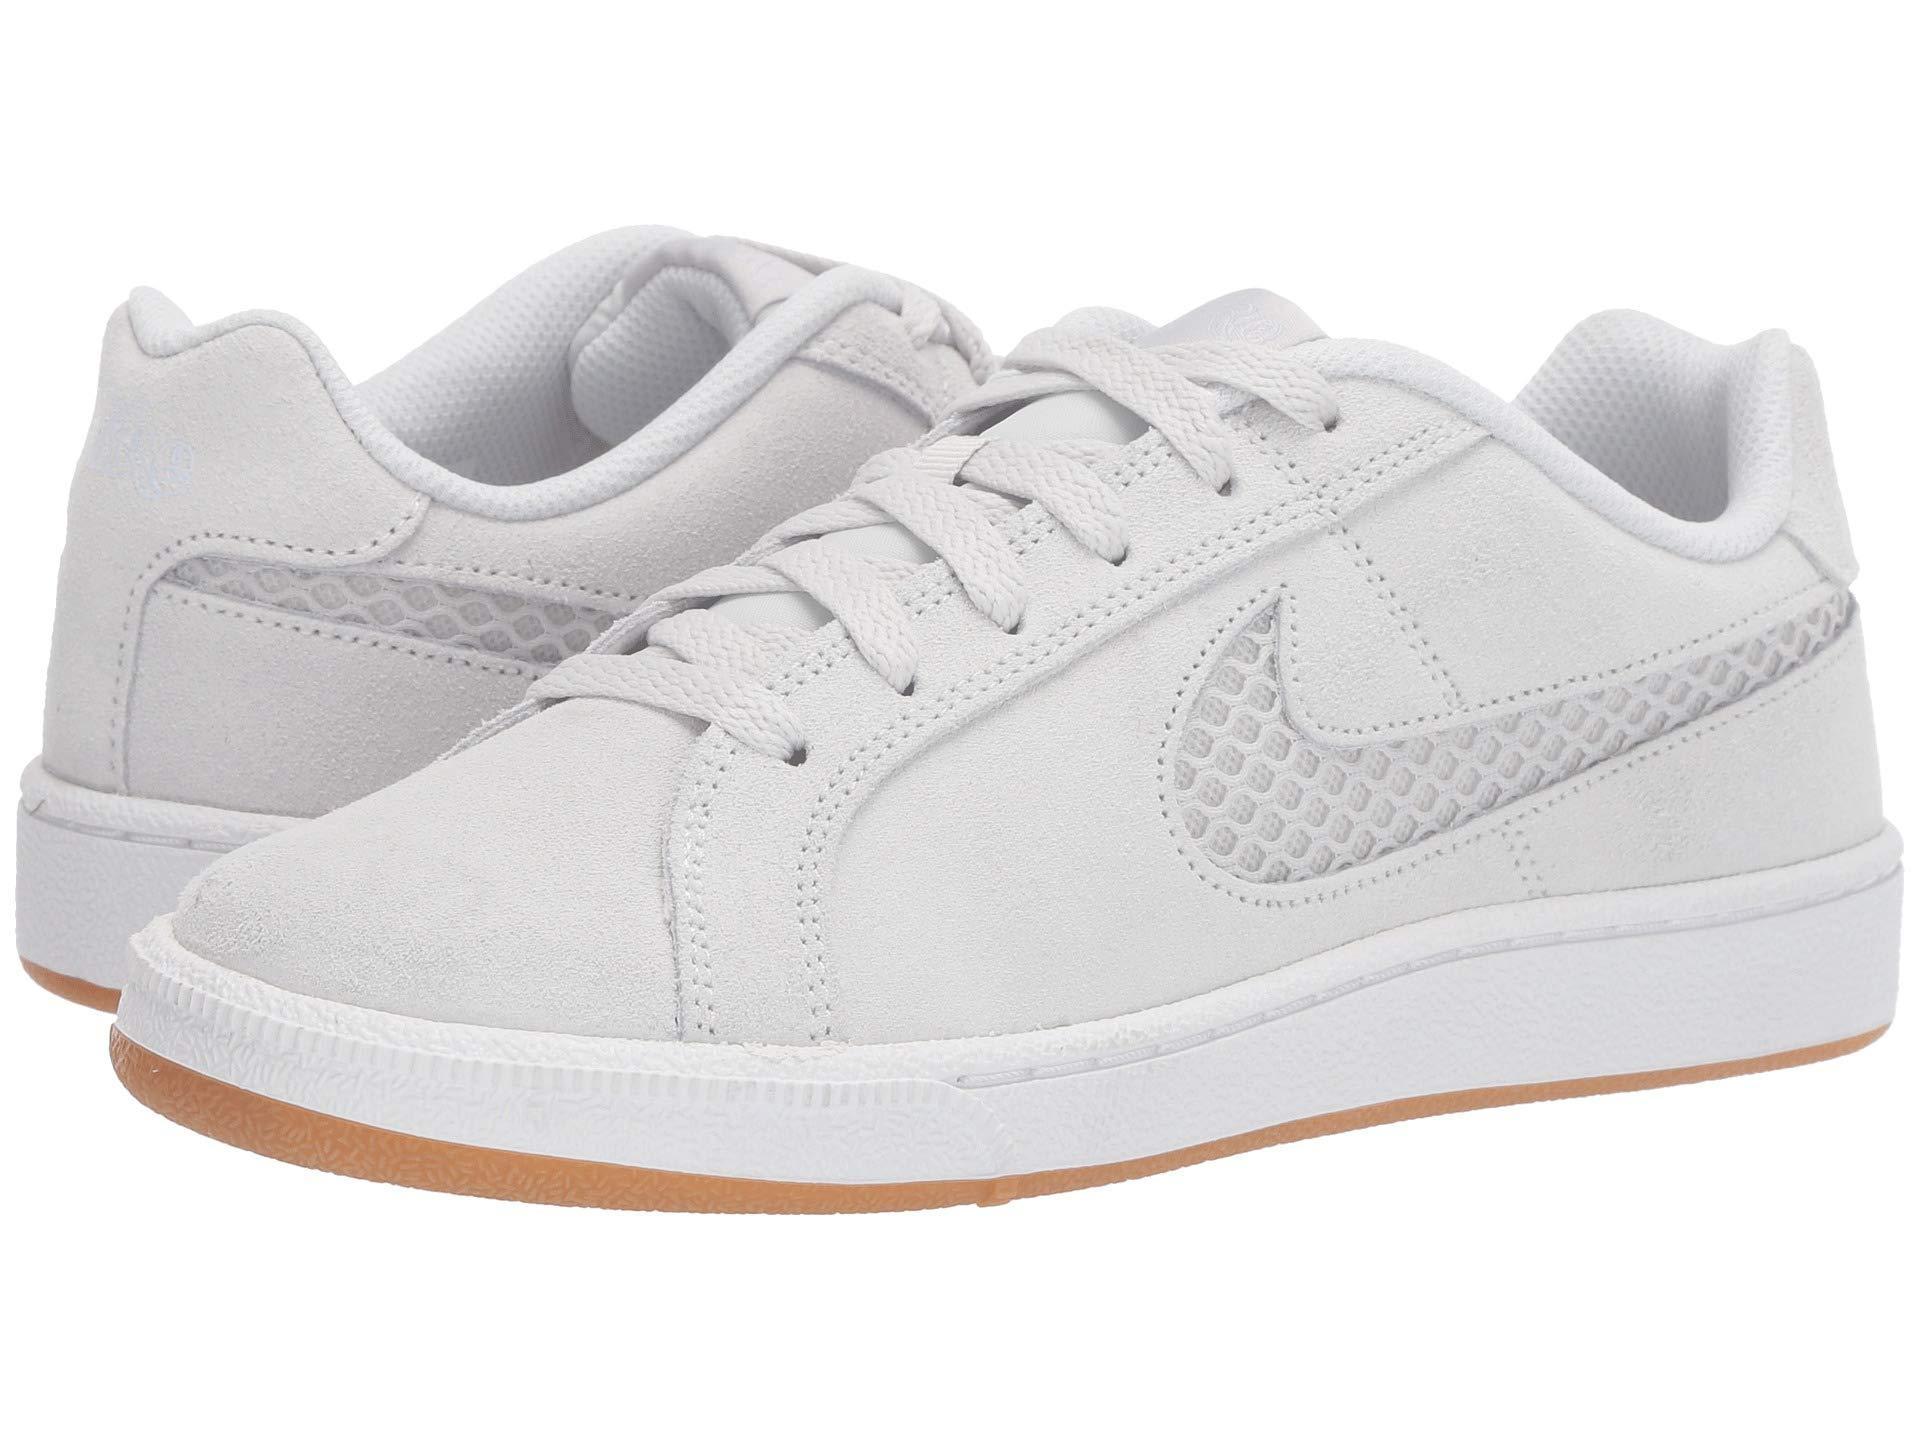 Lyst - Nike Court Royale Suede (gunsmoke gunsmoke phantom) Women s Shoes 2e6ae23657